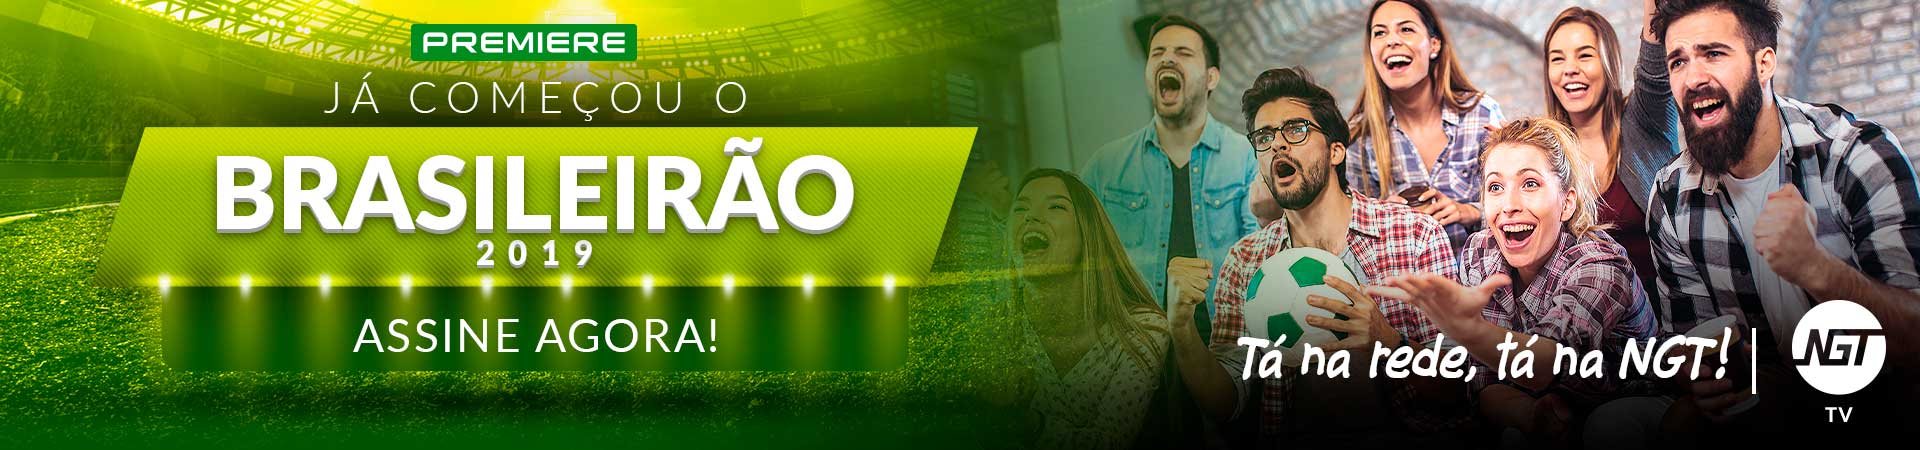 12-08-2019-banner-brasileirao